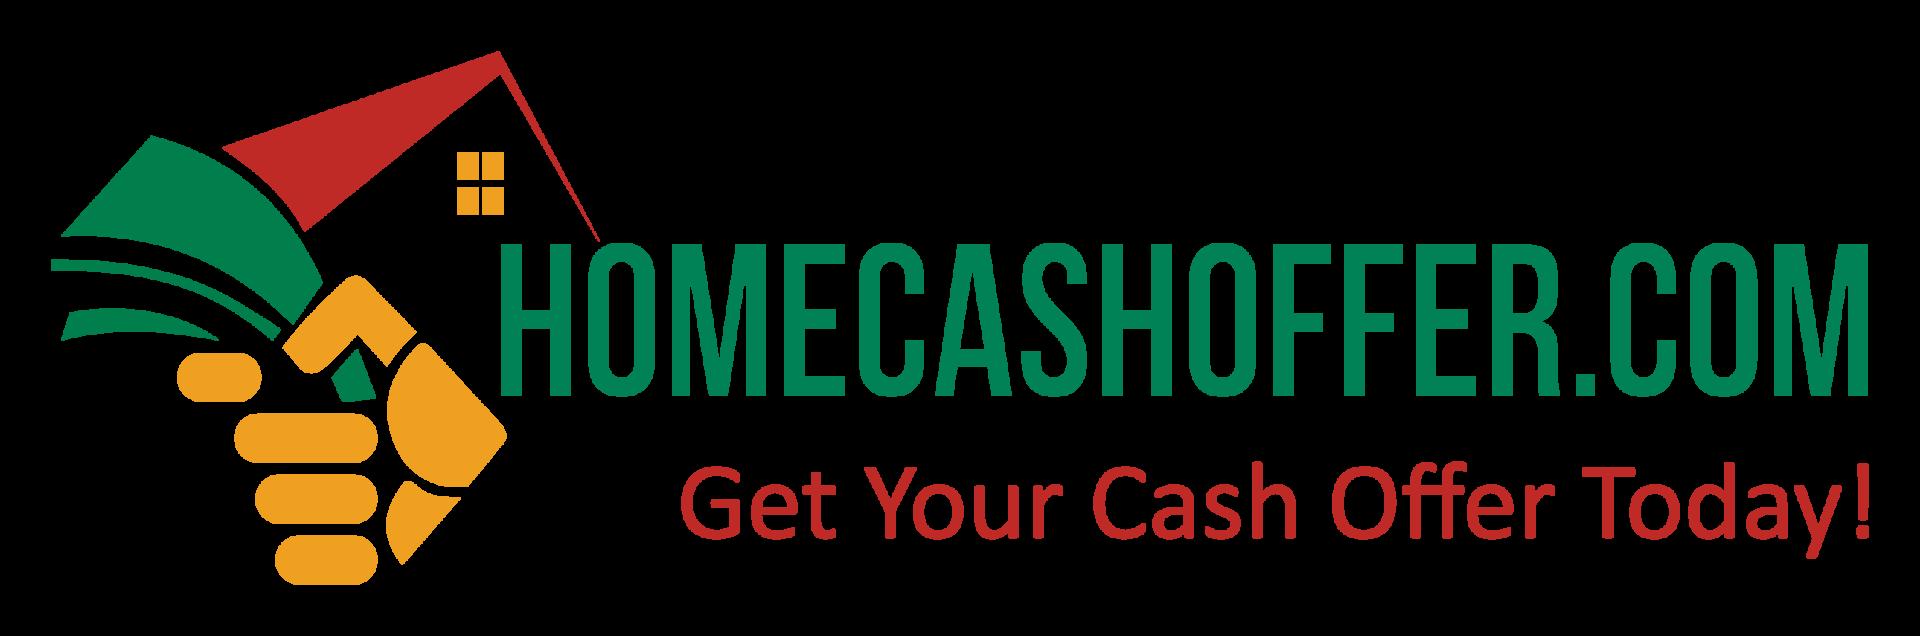 Homecashoffer logo